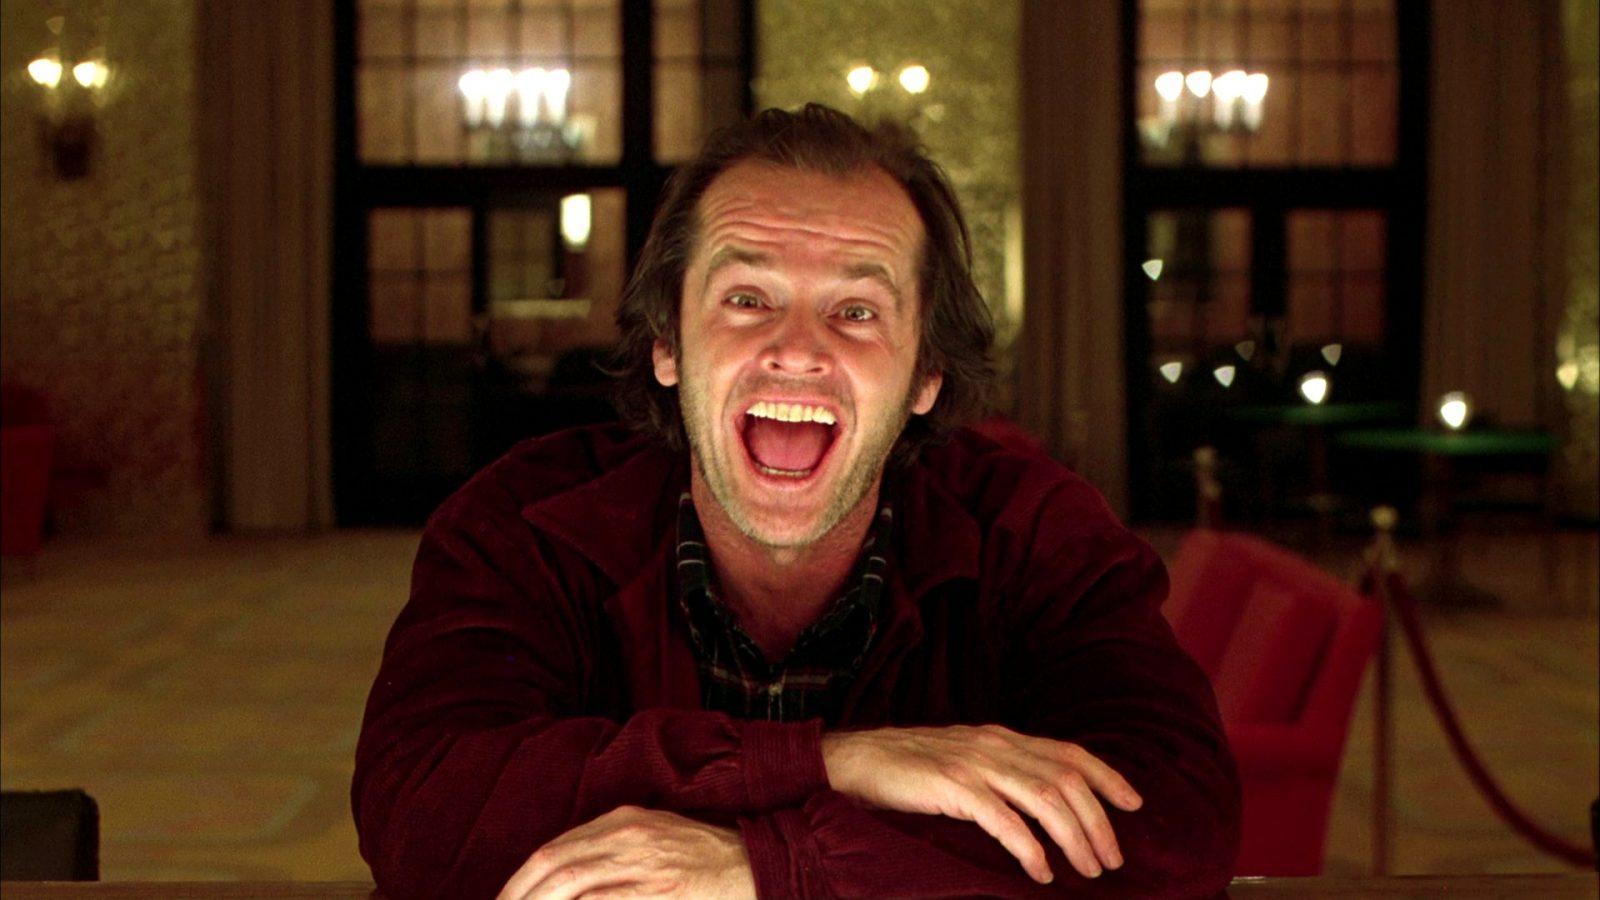 The-Shining-1980-Jack-Nicholson-as-Jack-Torrance